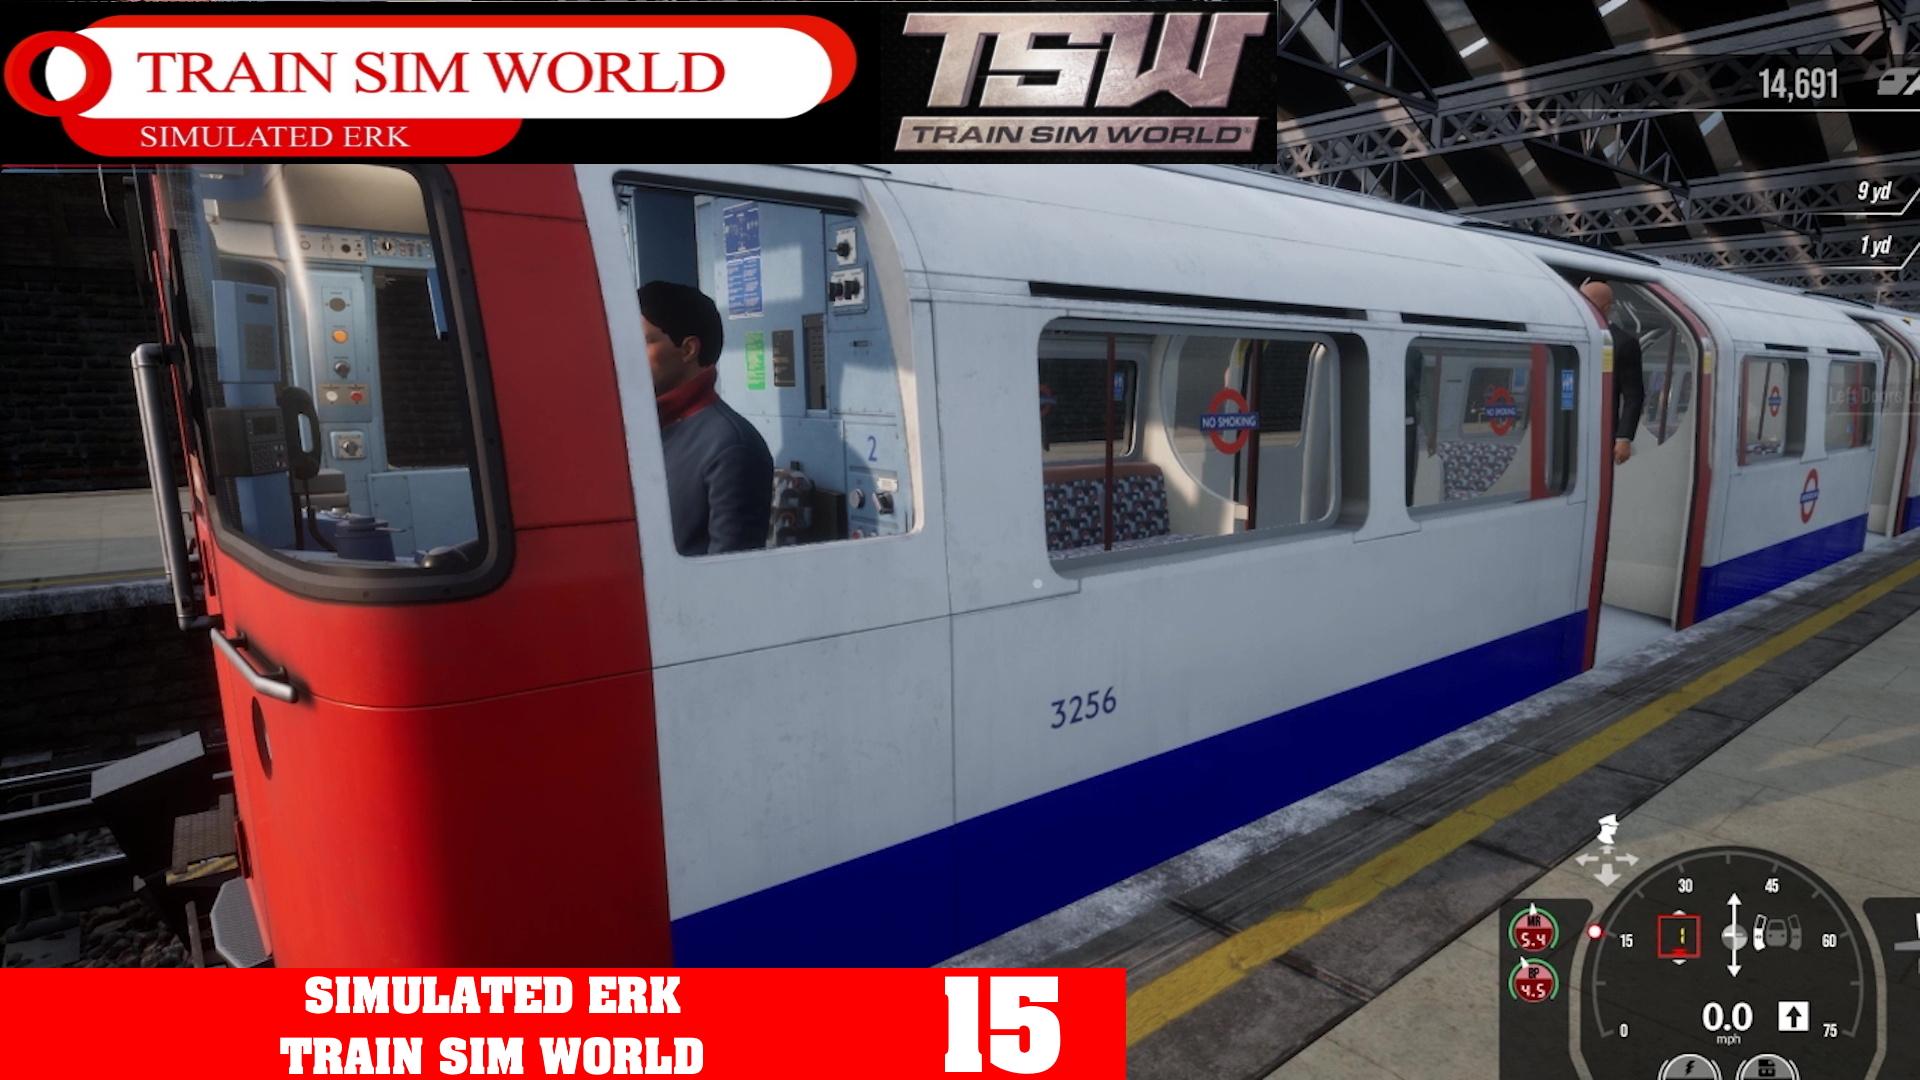 Simulated Erk: Train Sim World episode 15   Bakerloo Line First Look